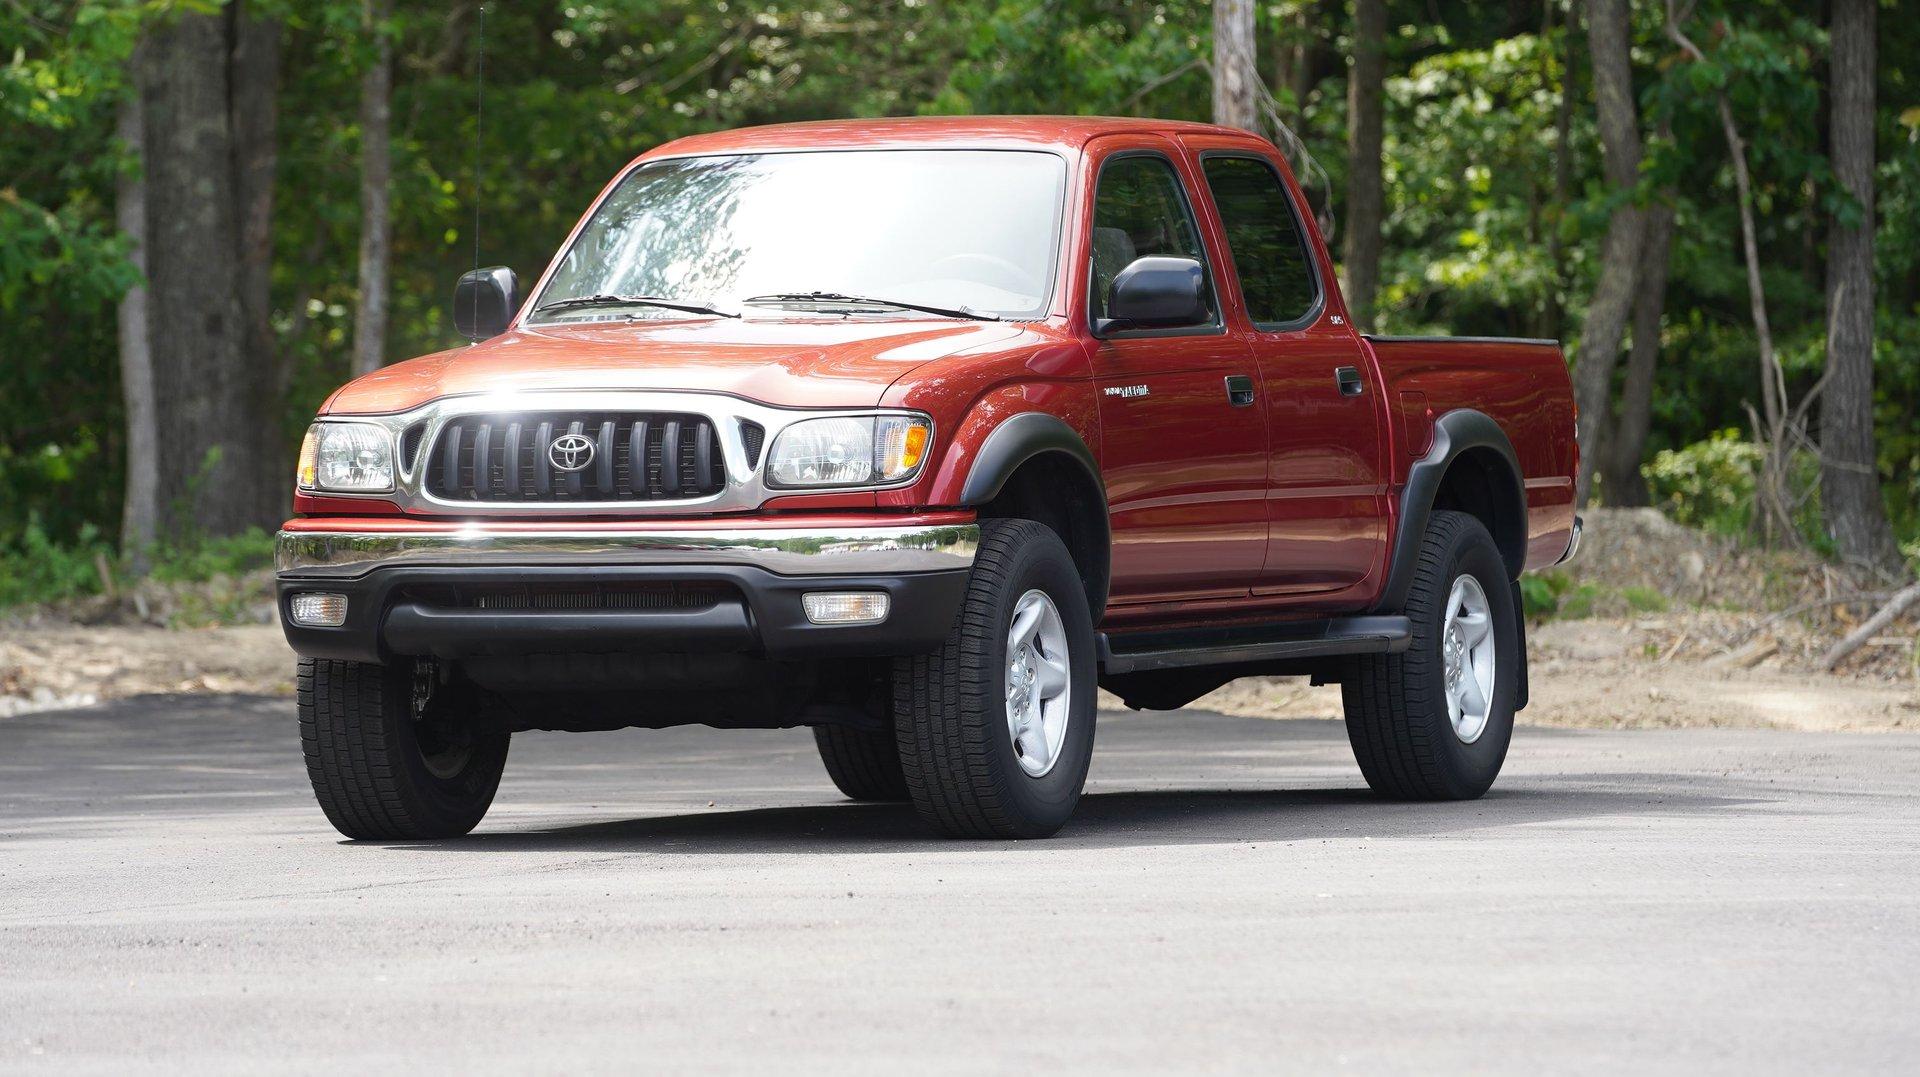 2002 toyota tacoma doublecab prerunner v6 auto natl